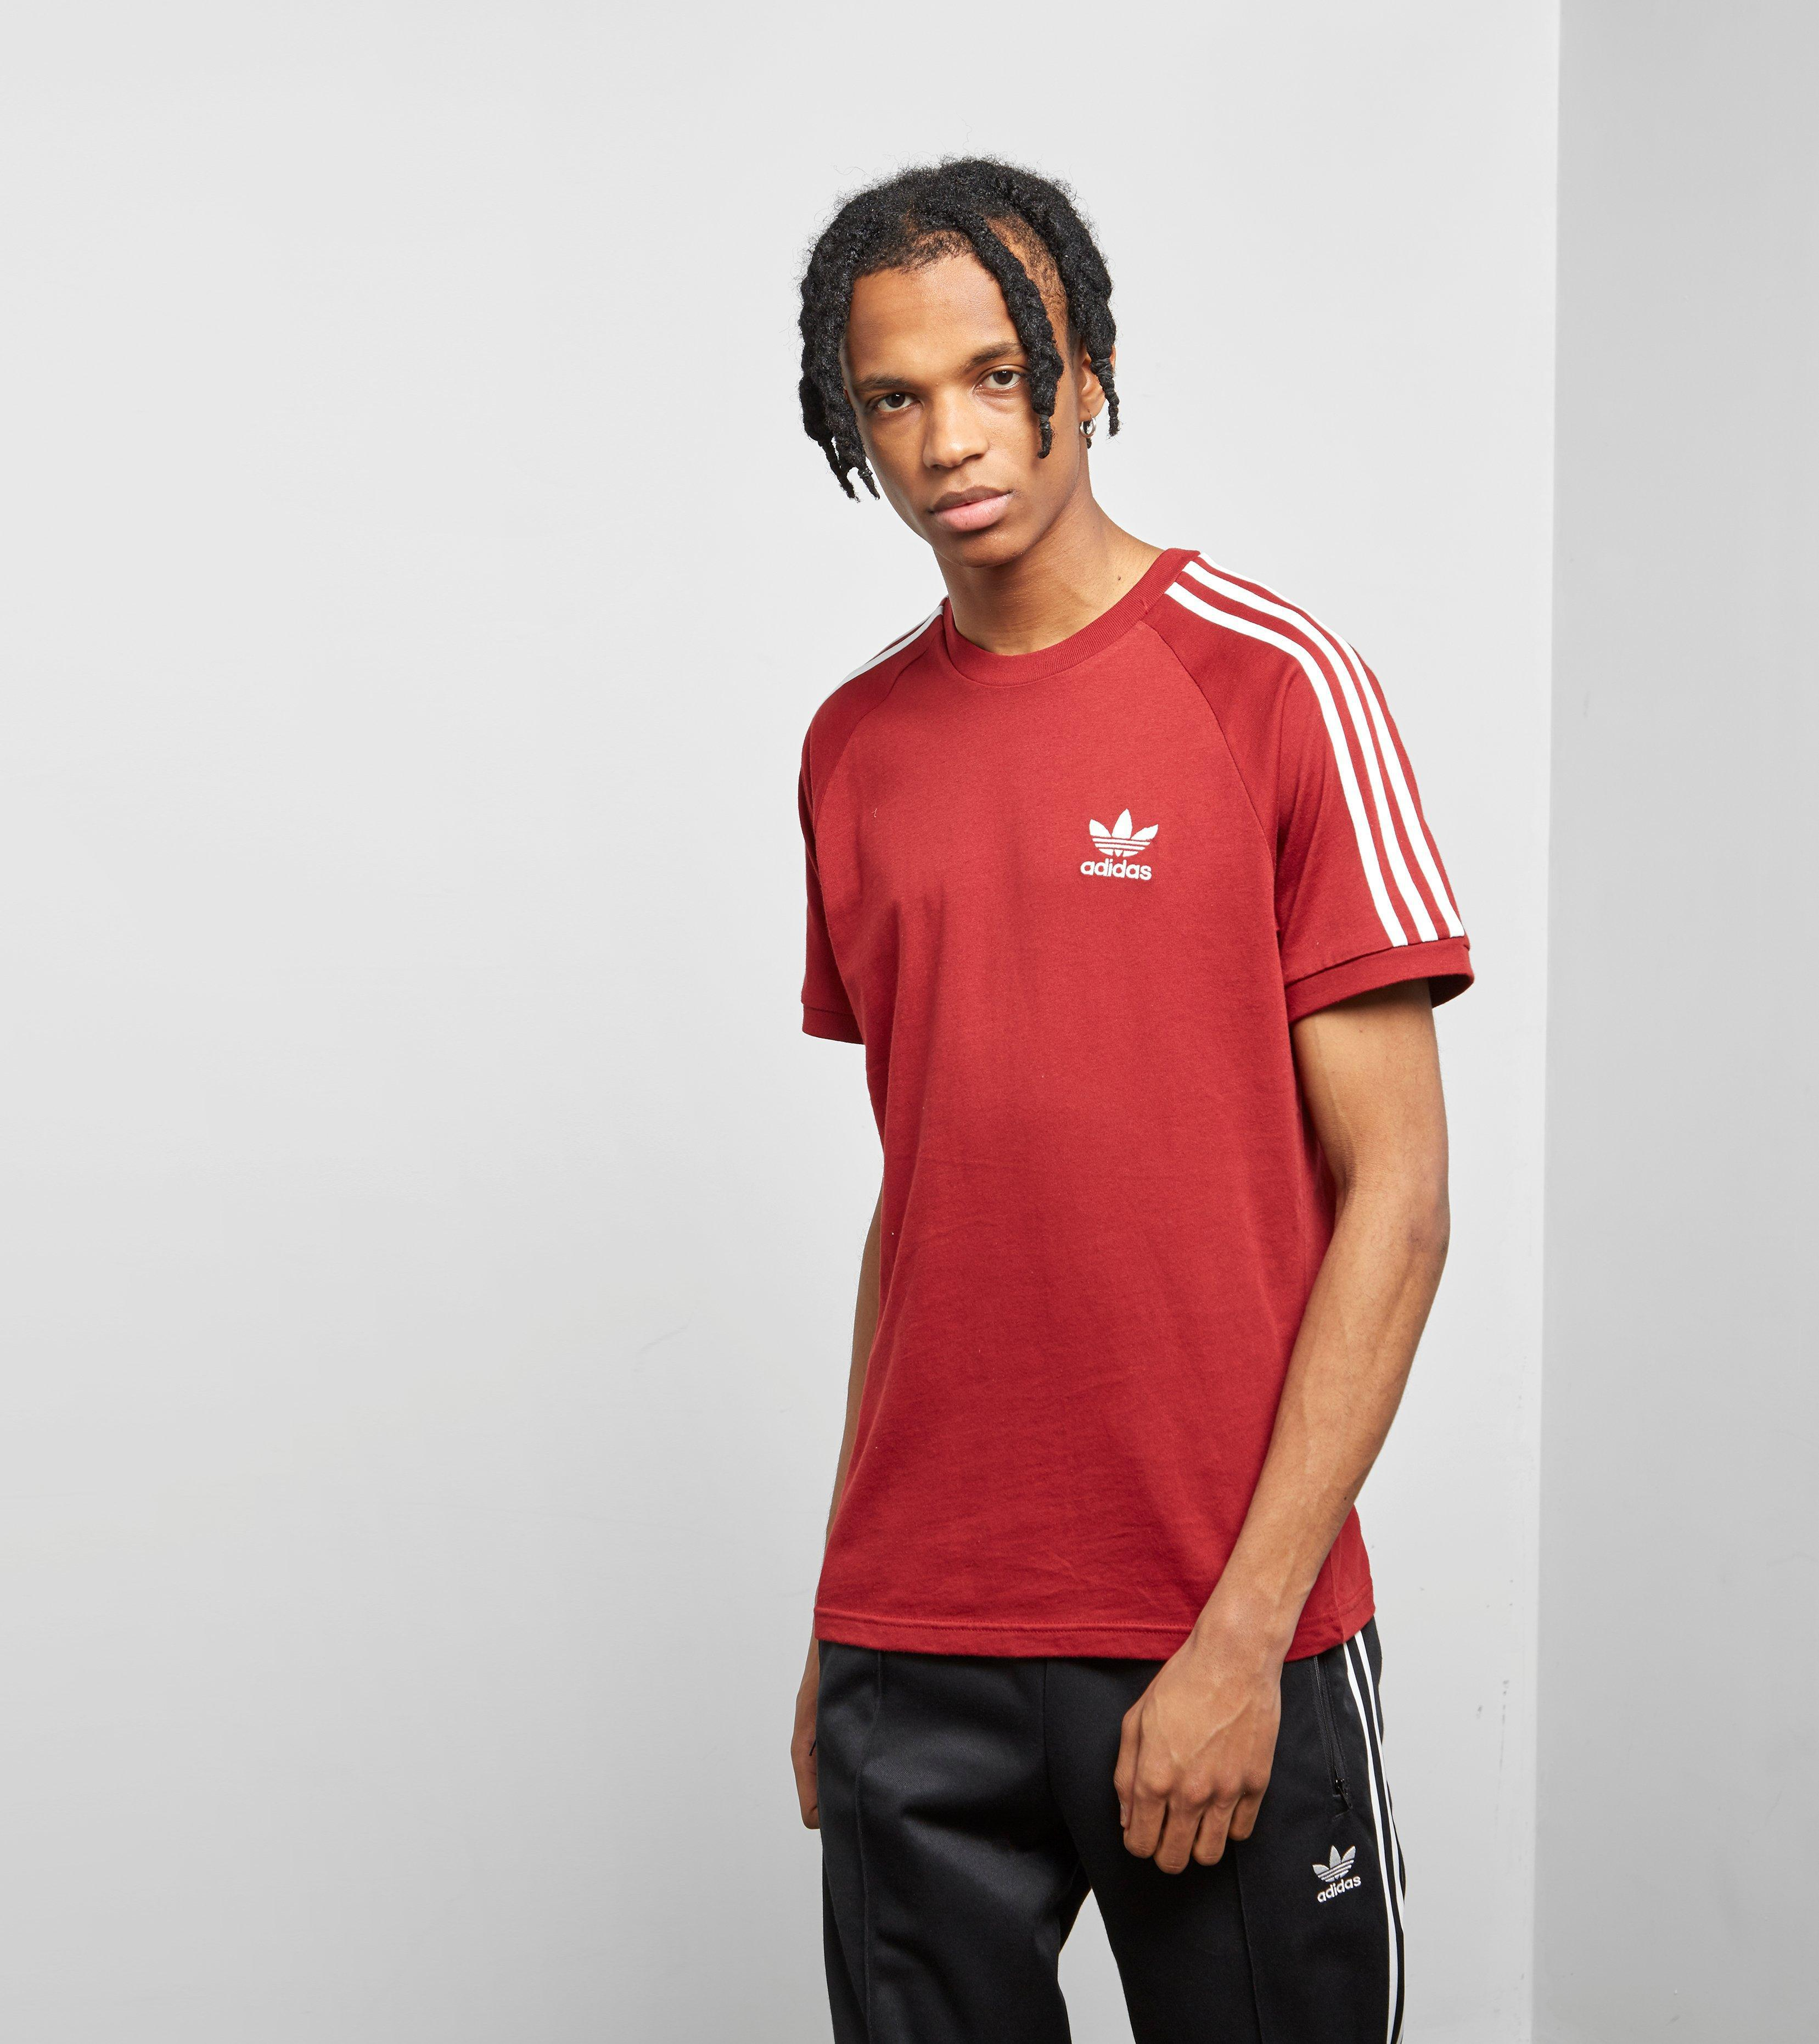 Adidas Originals 3 Stripe T Shirt Red | Toffee Art